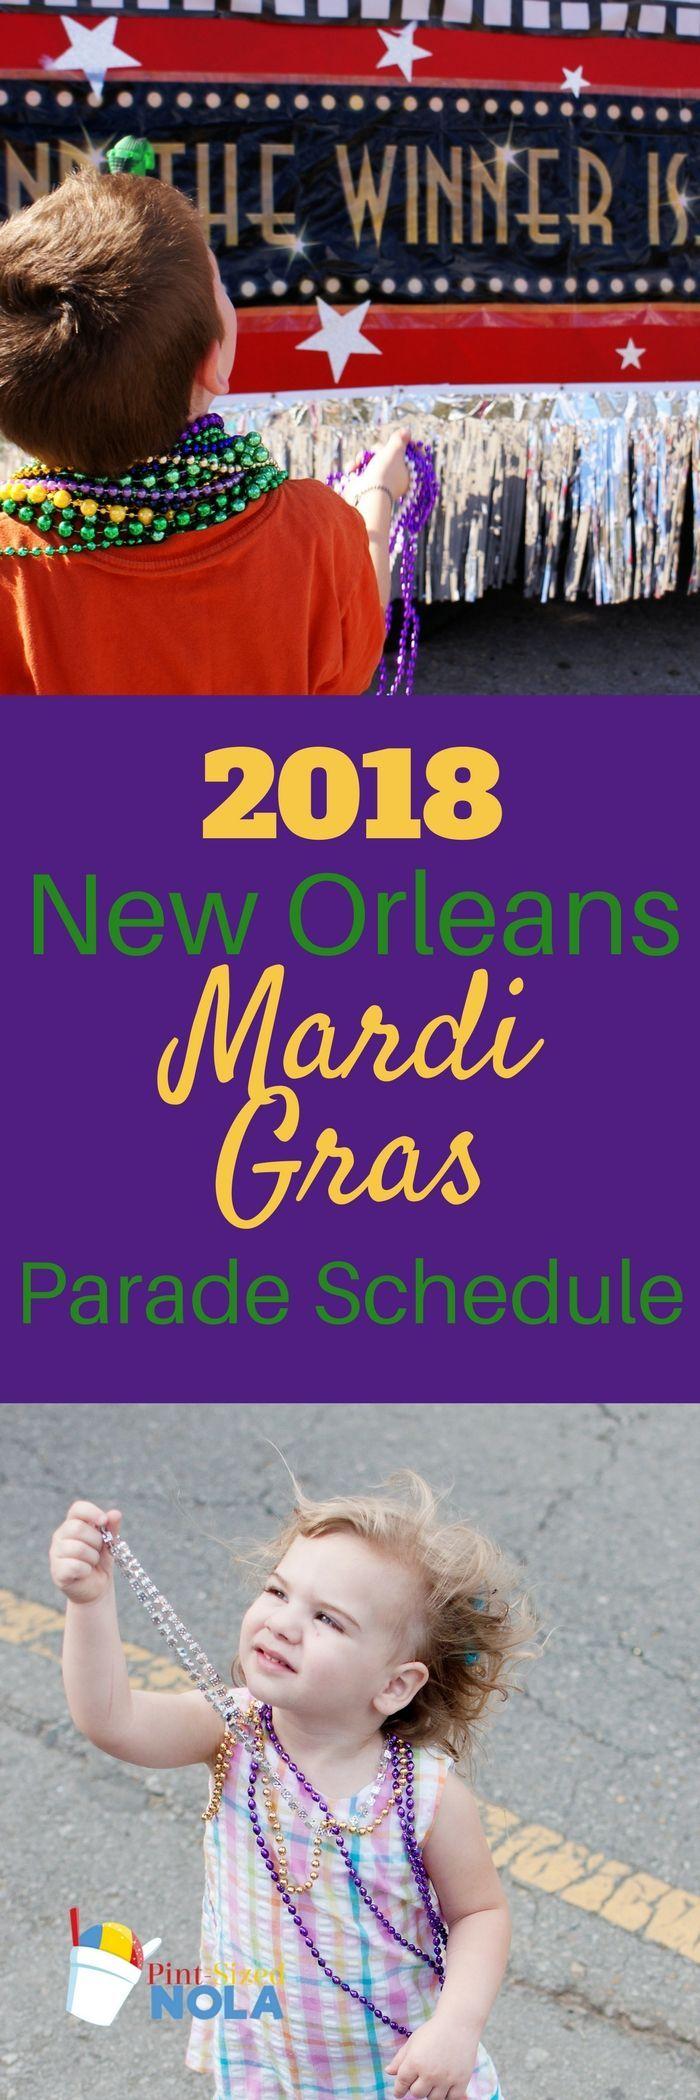 2018 New Orleans Mardi Gras Parade Schedule